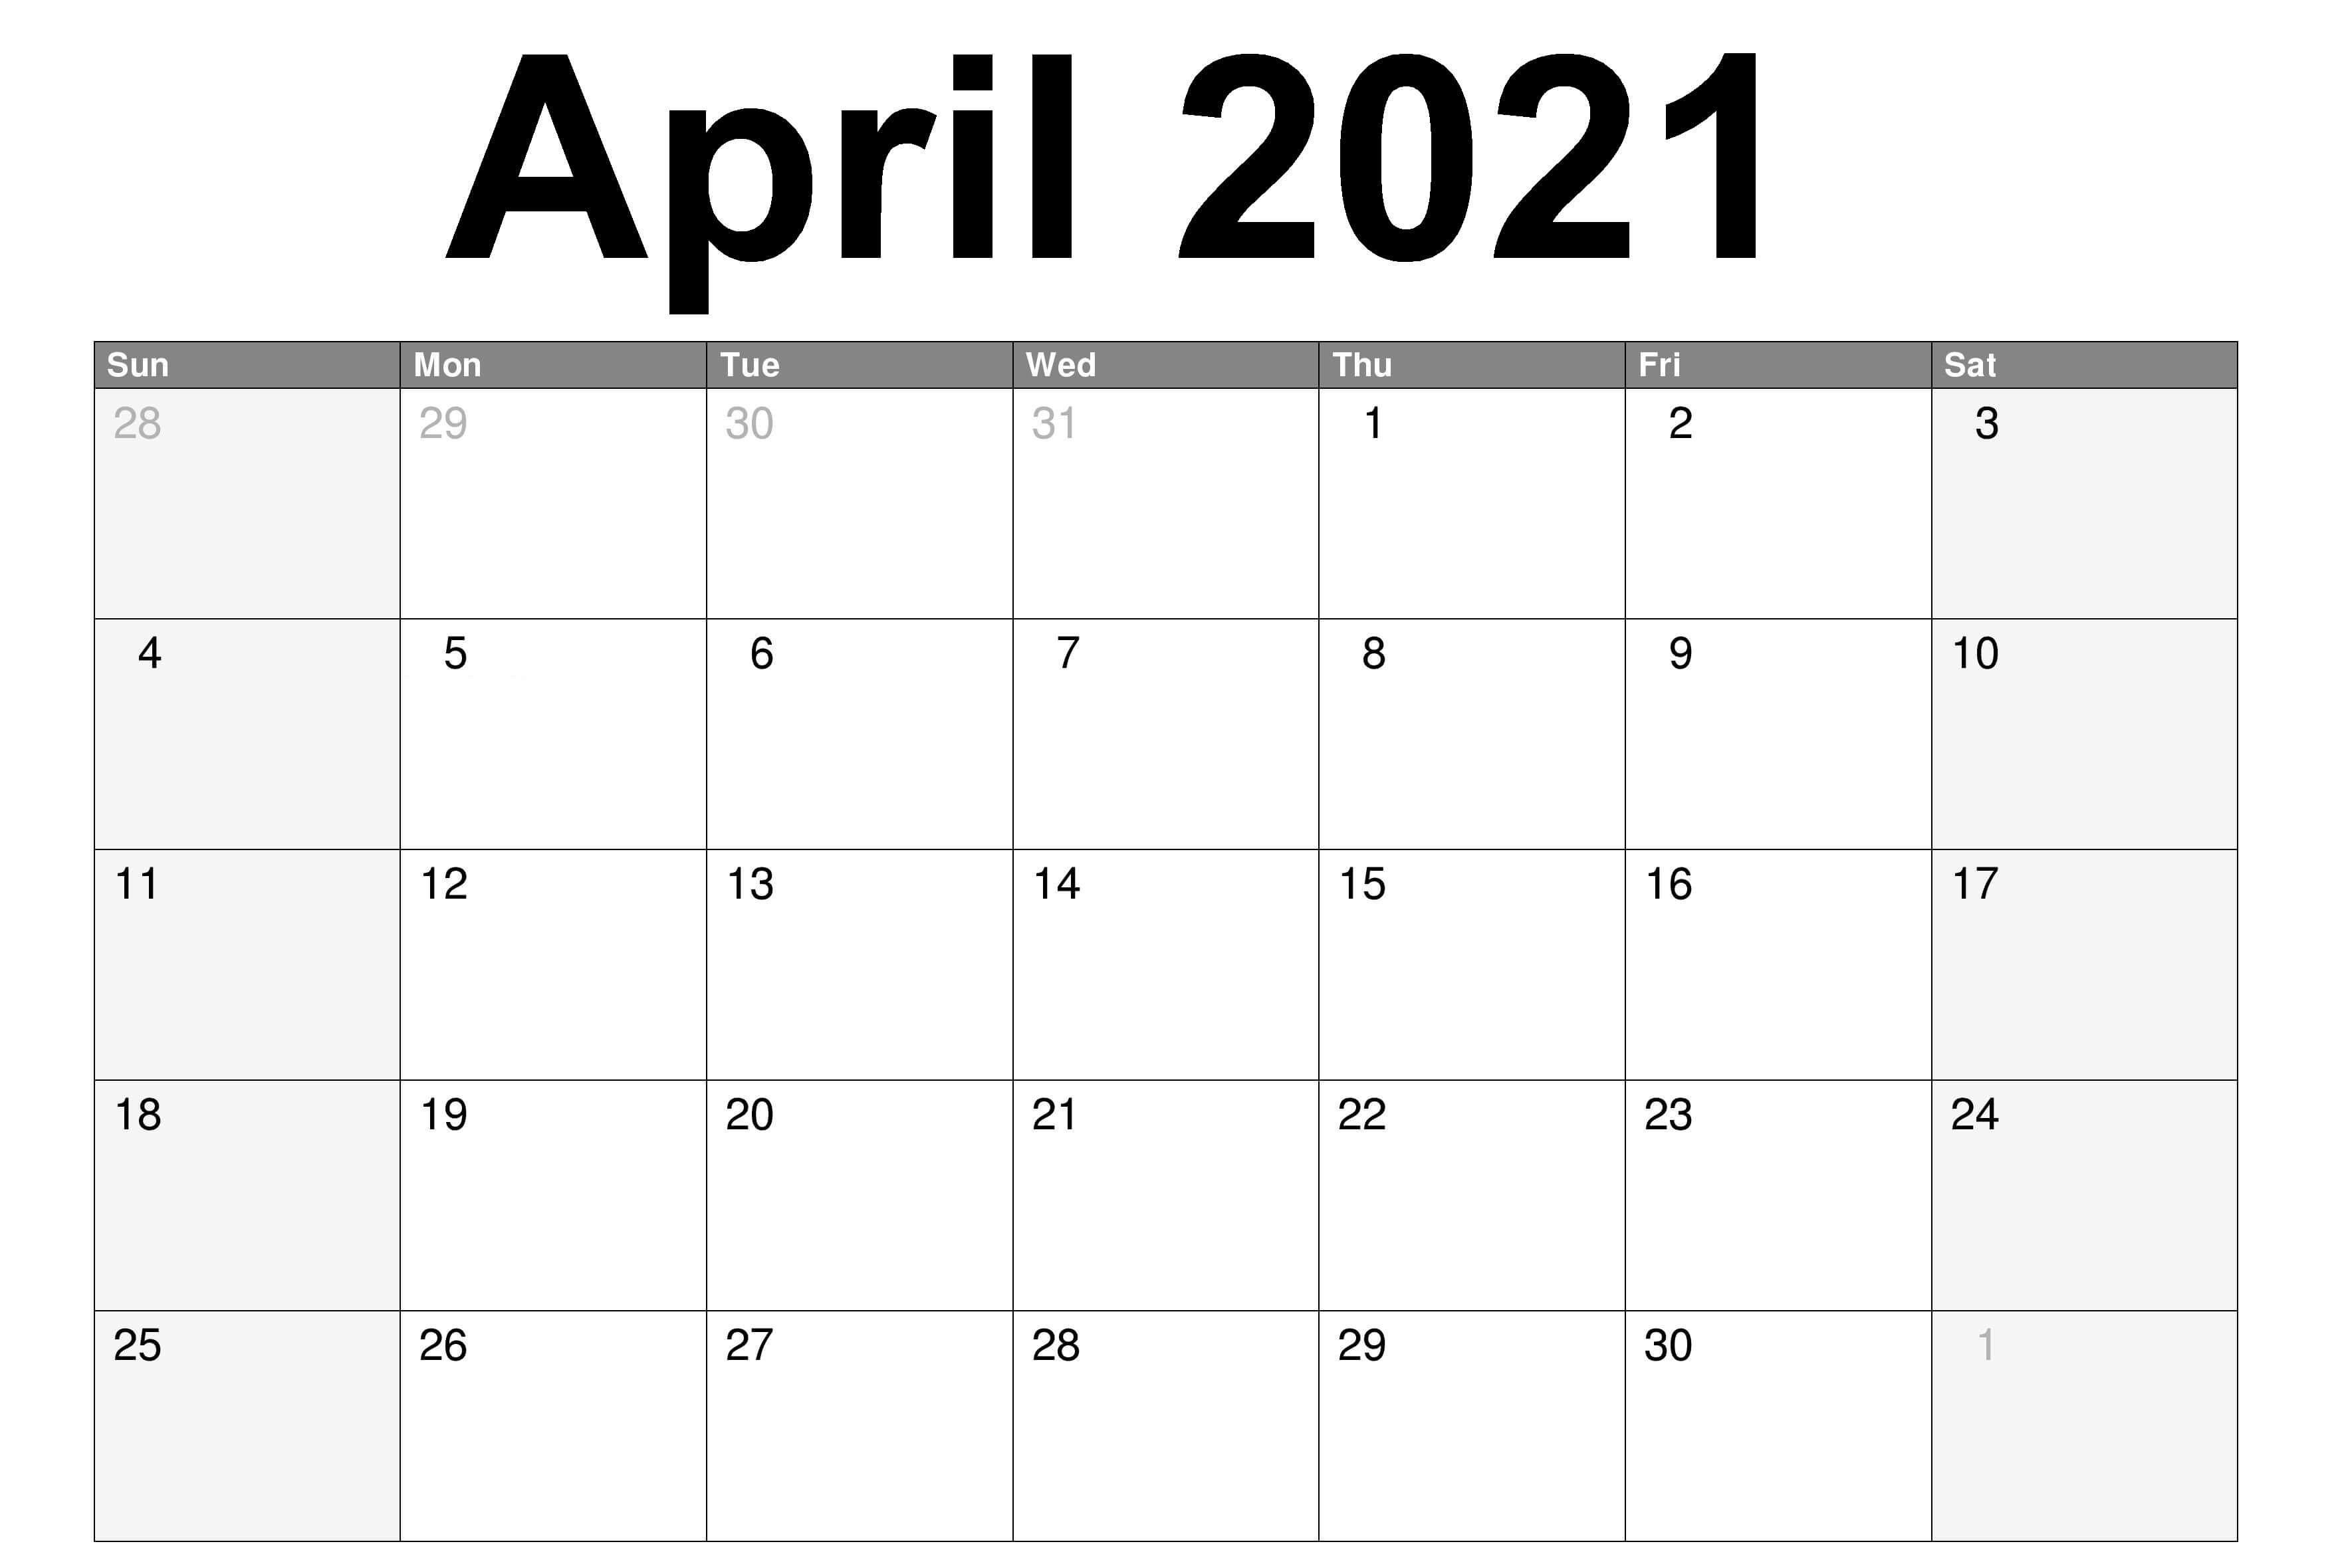 2021 April Printable Calendar Calendar March Printable Calendar July June Calendar Printable